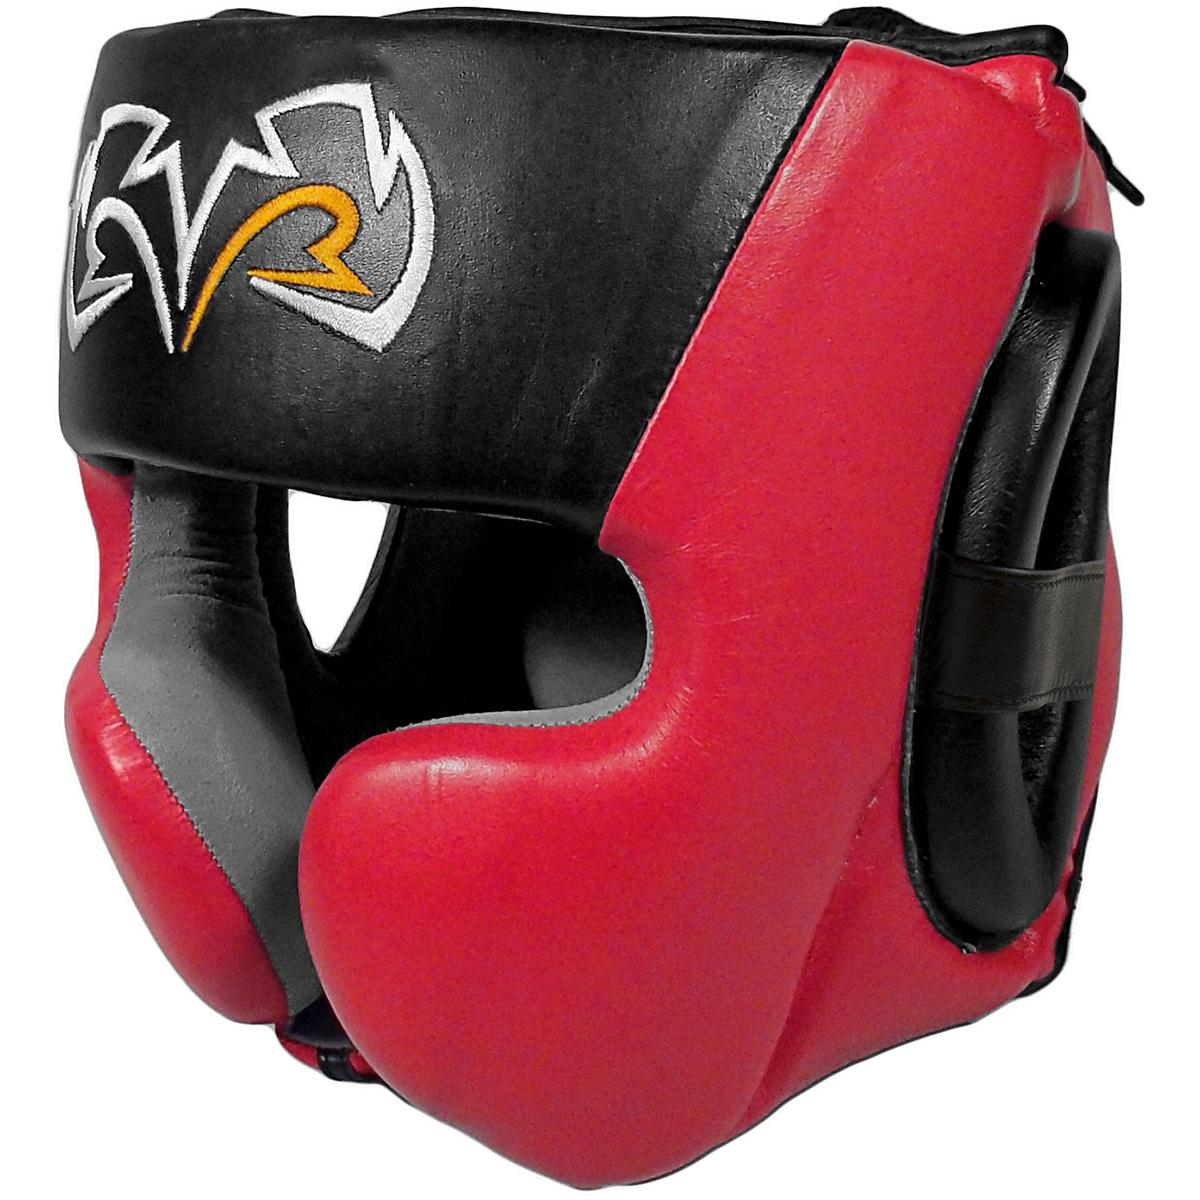 thumbnail 7 - RIVAL Boxing RHG30 Mexican Training Headgear